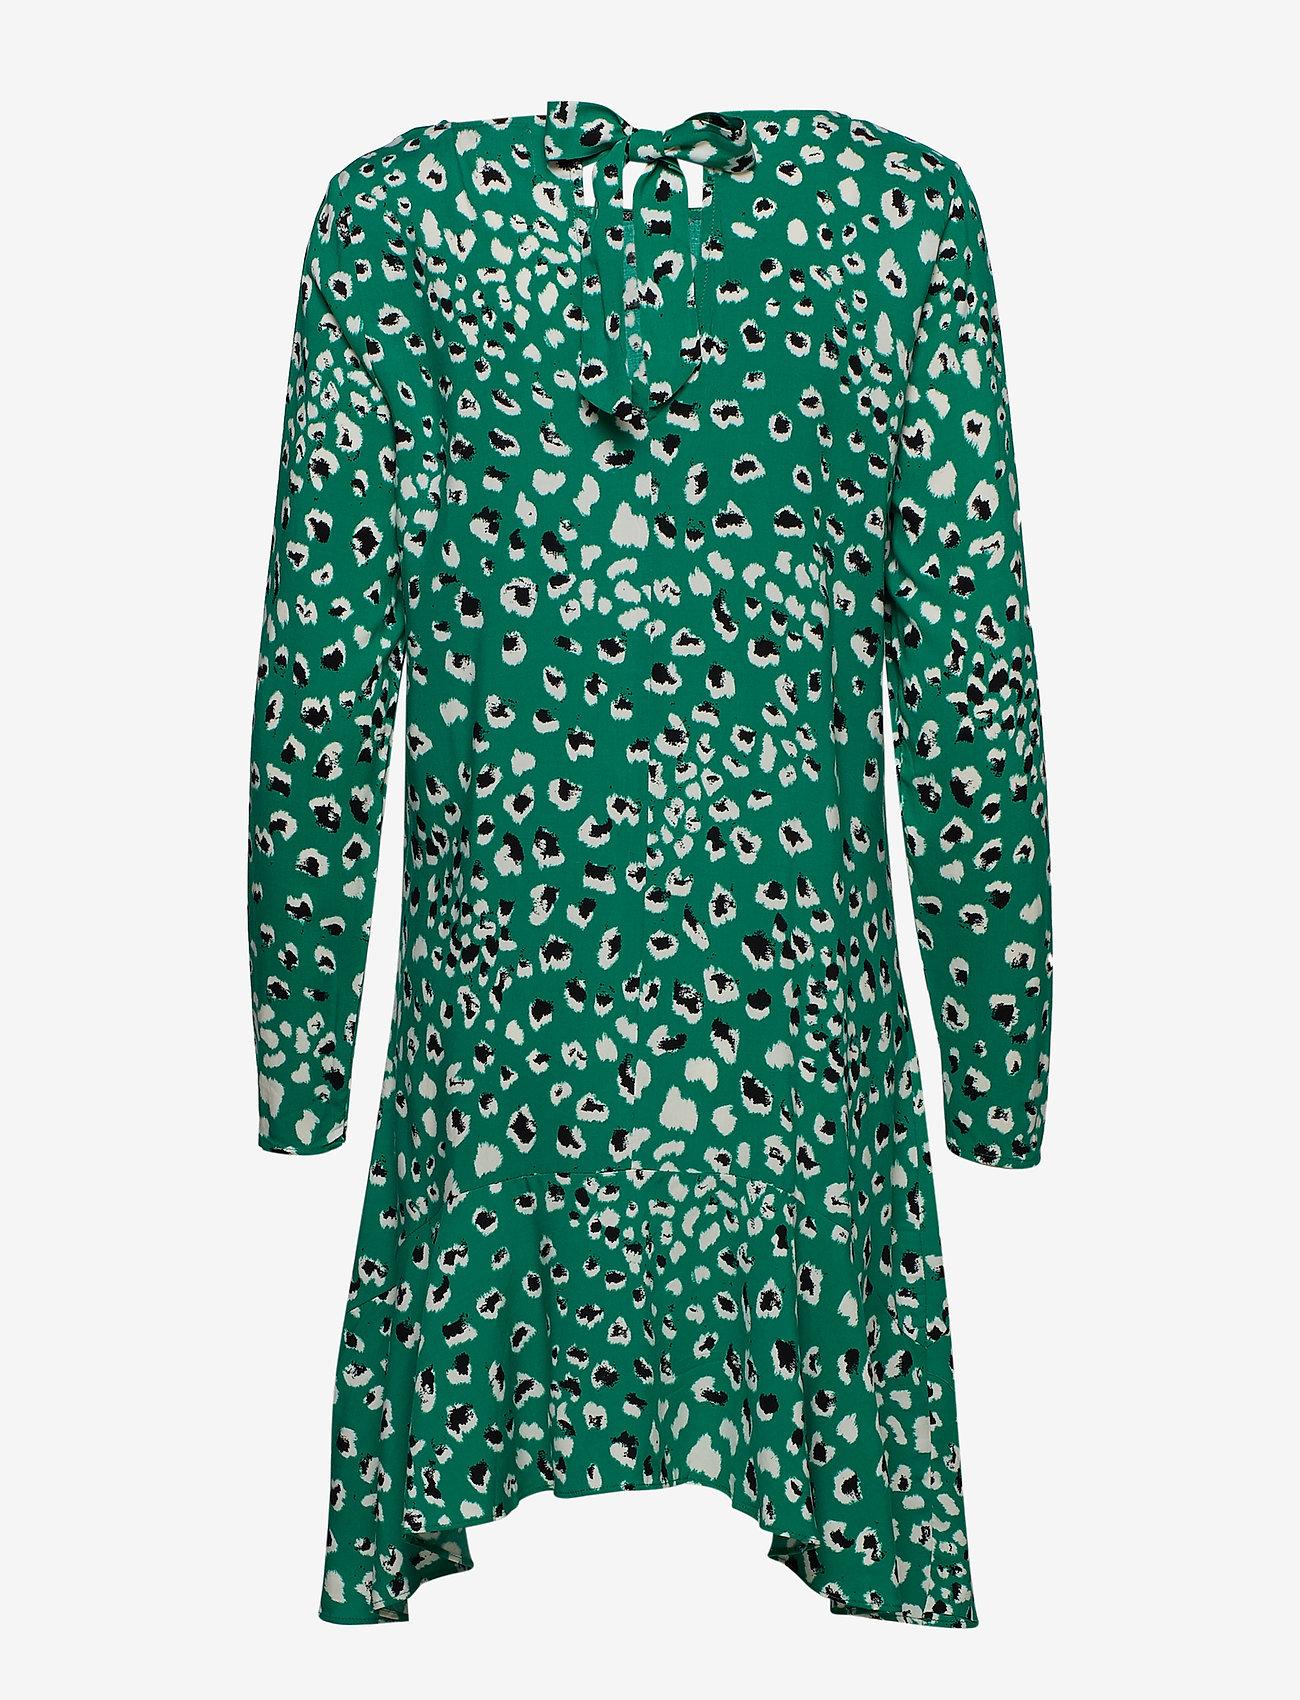 Viatta Pardas L/s Dress (Pepper Green) - Vila v446oN